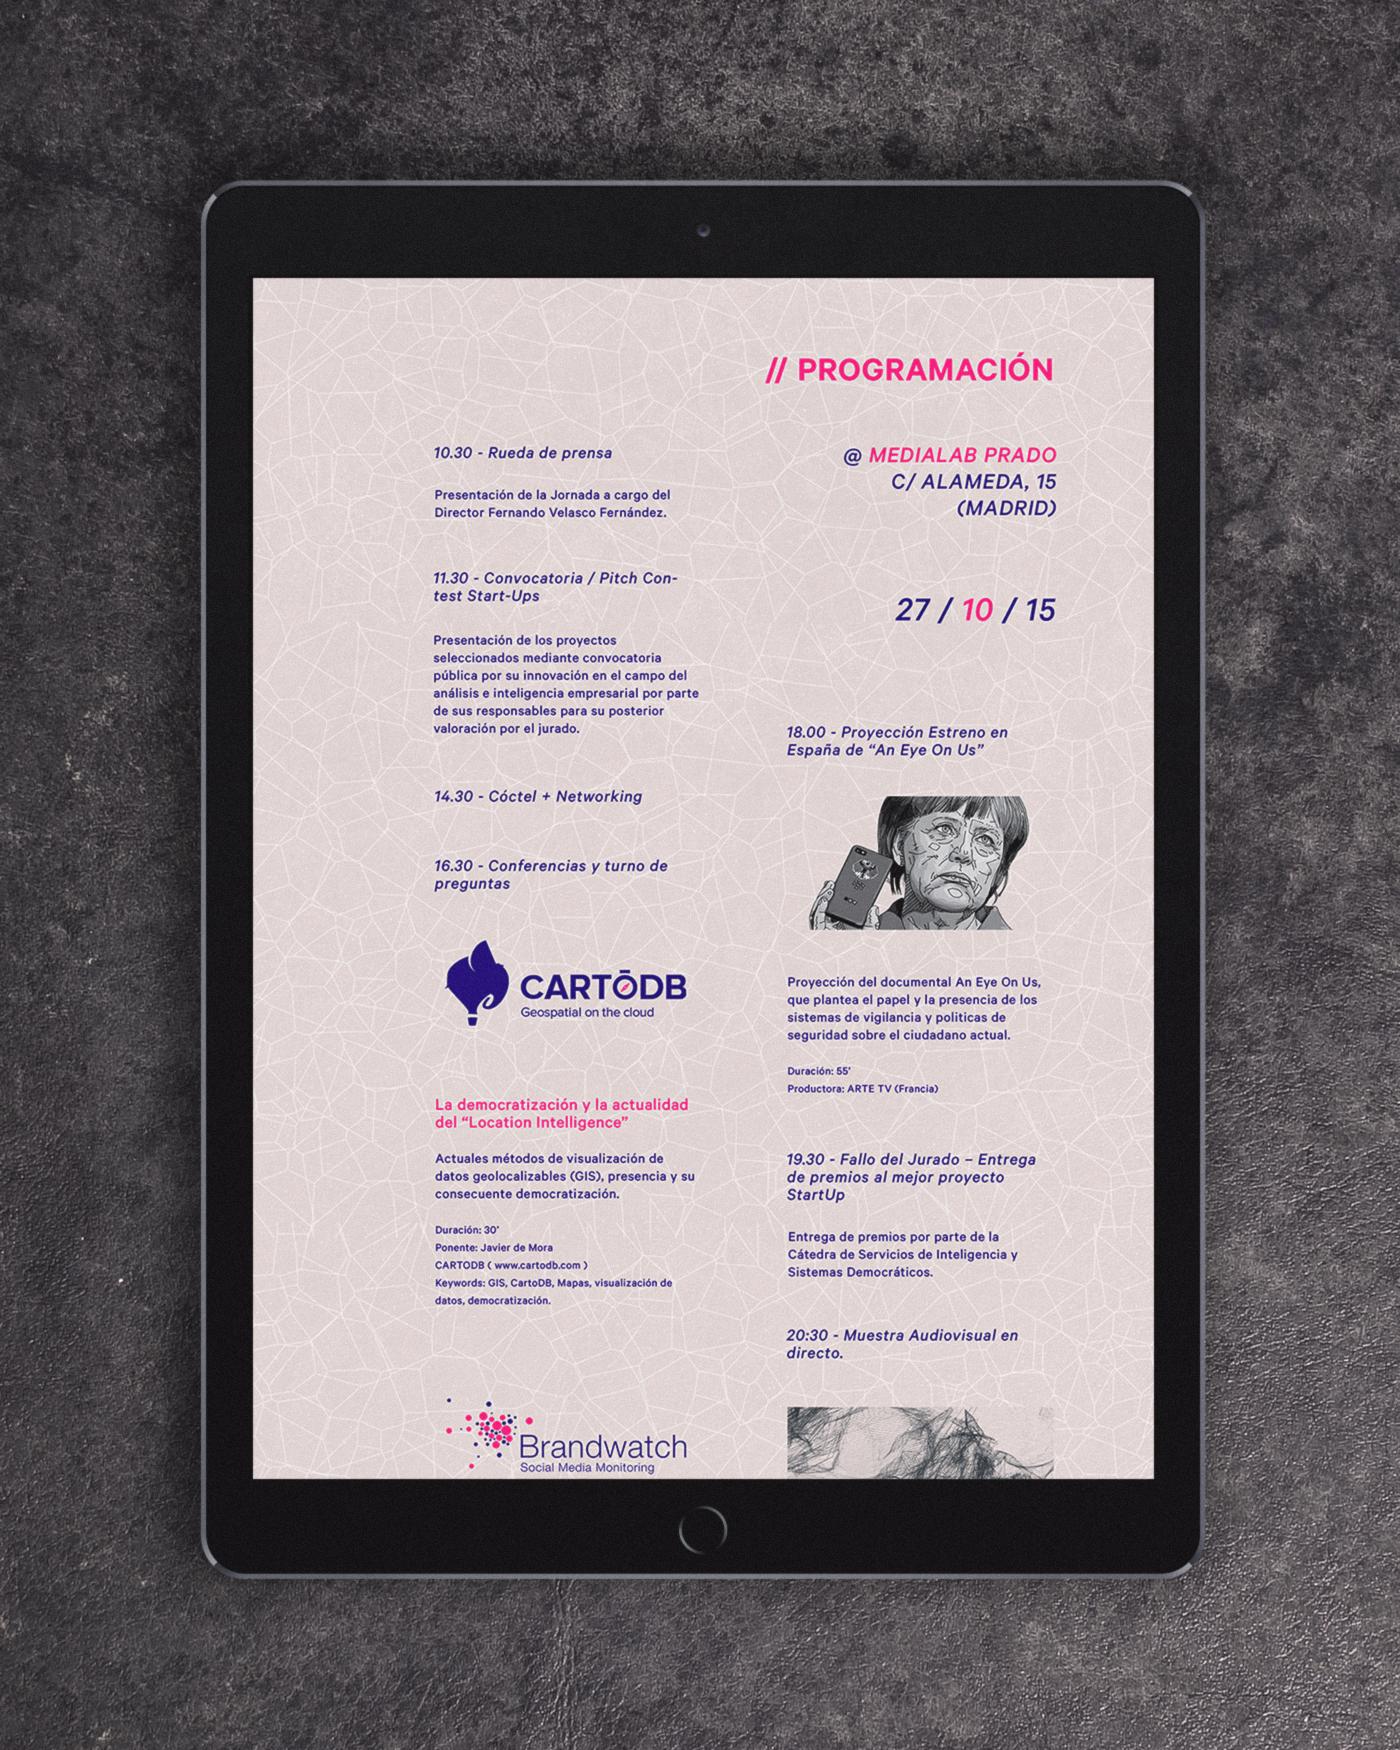 Cátedra web design ipad